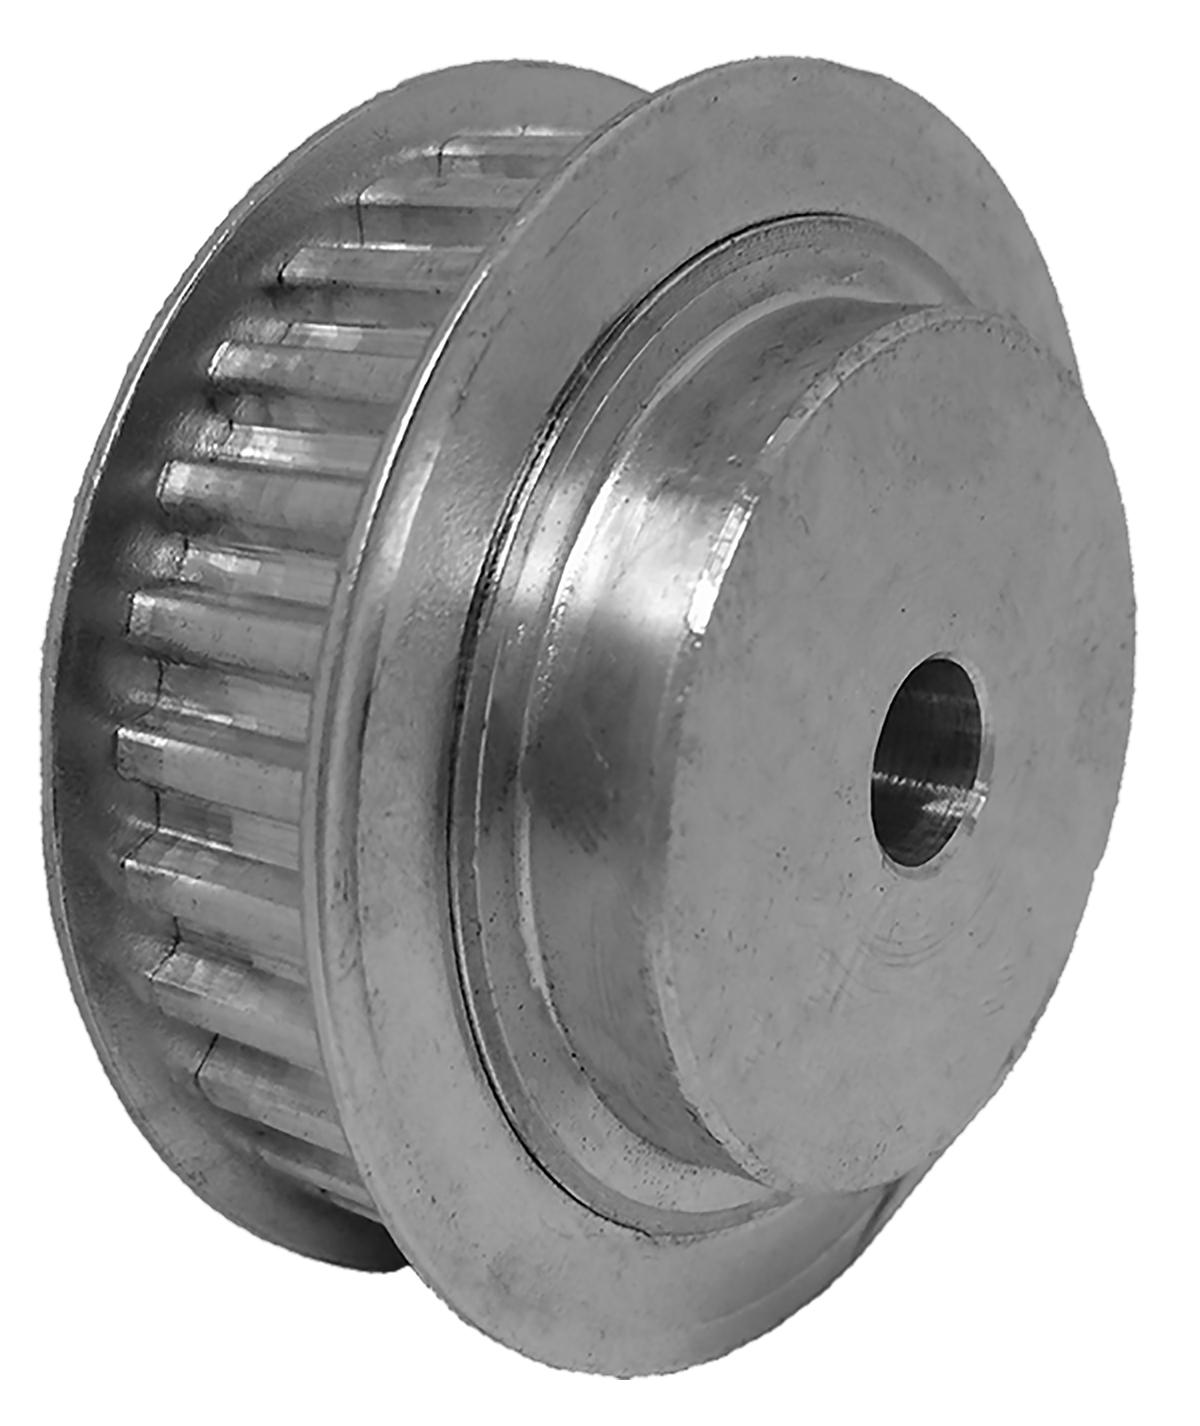 21T5/30-2 - Aluminum Metric Pulleys